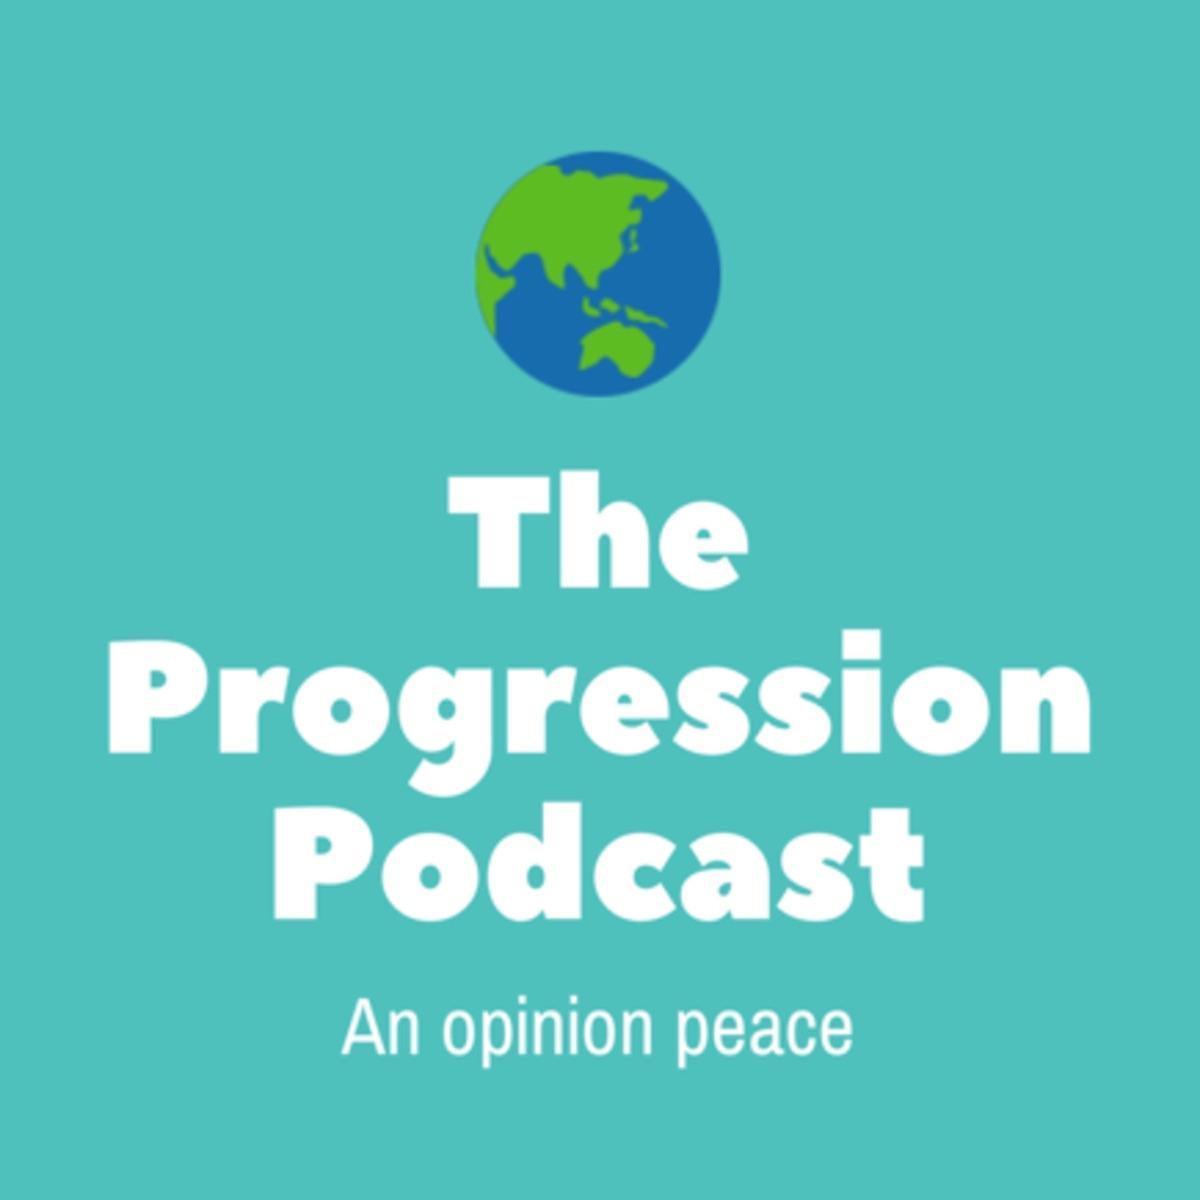 The Progression Podcast